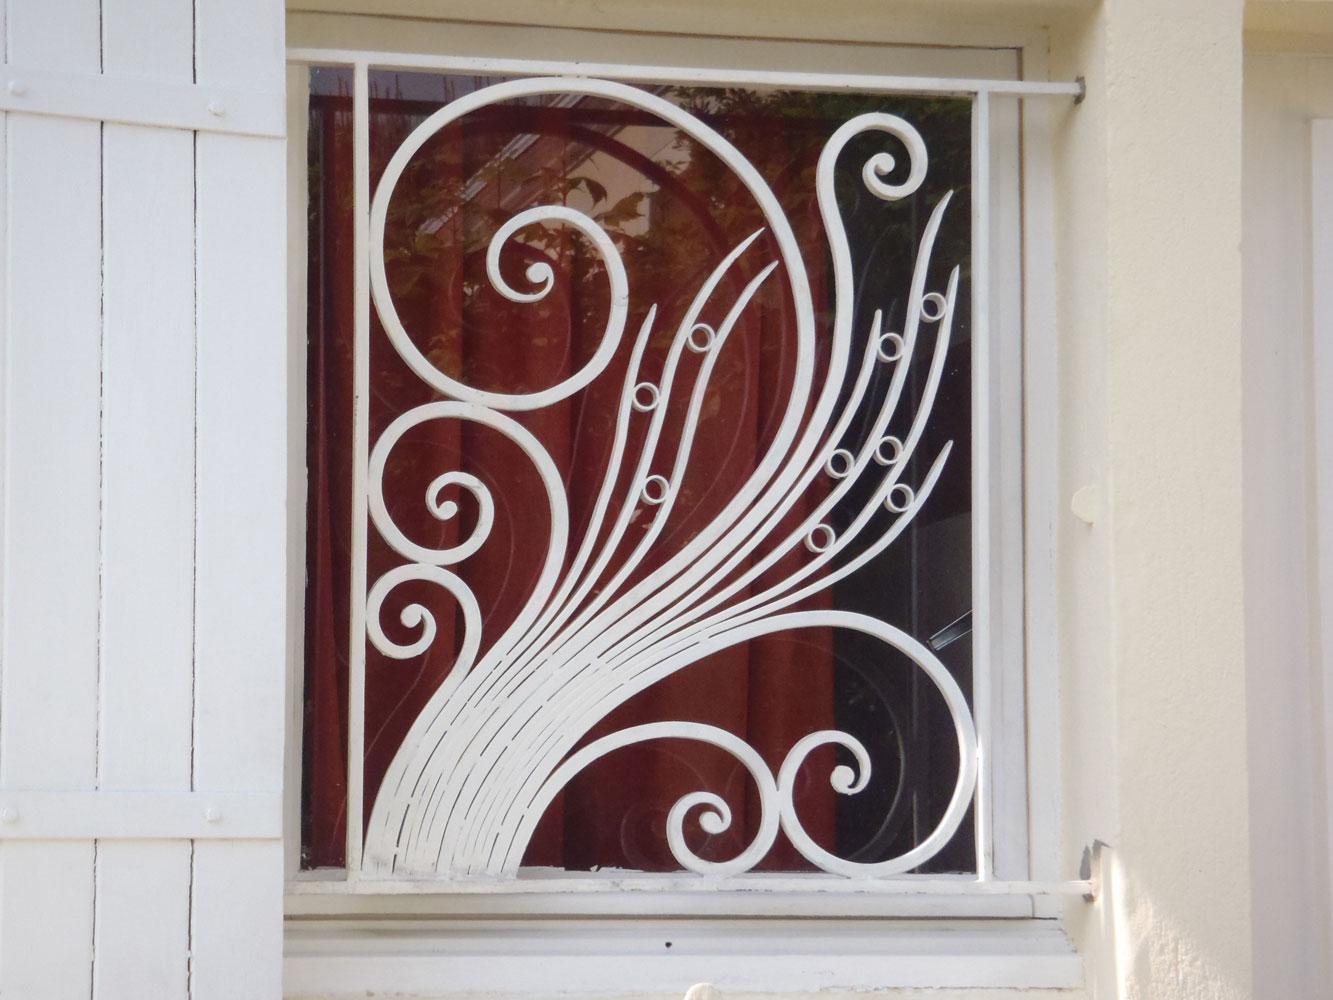 Ferronnerie d 39 art atelier fer emeraude bordeaux portail for Ferronnerie fenetre